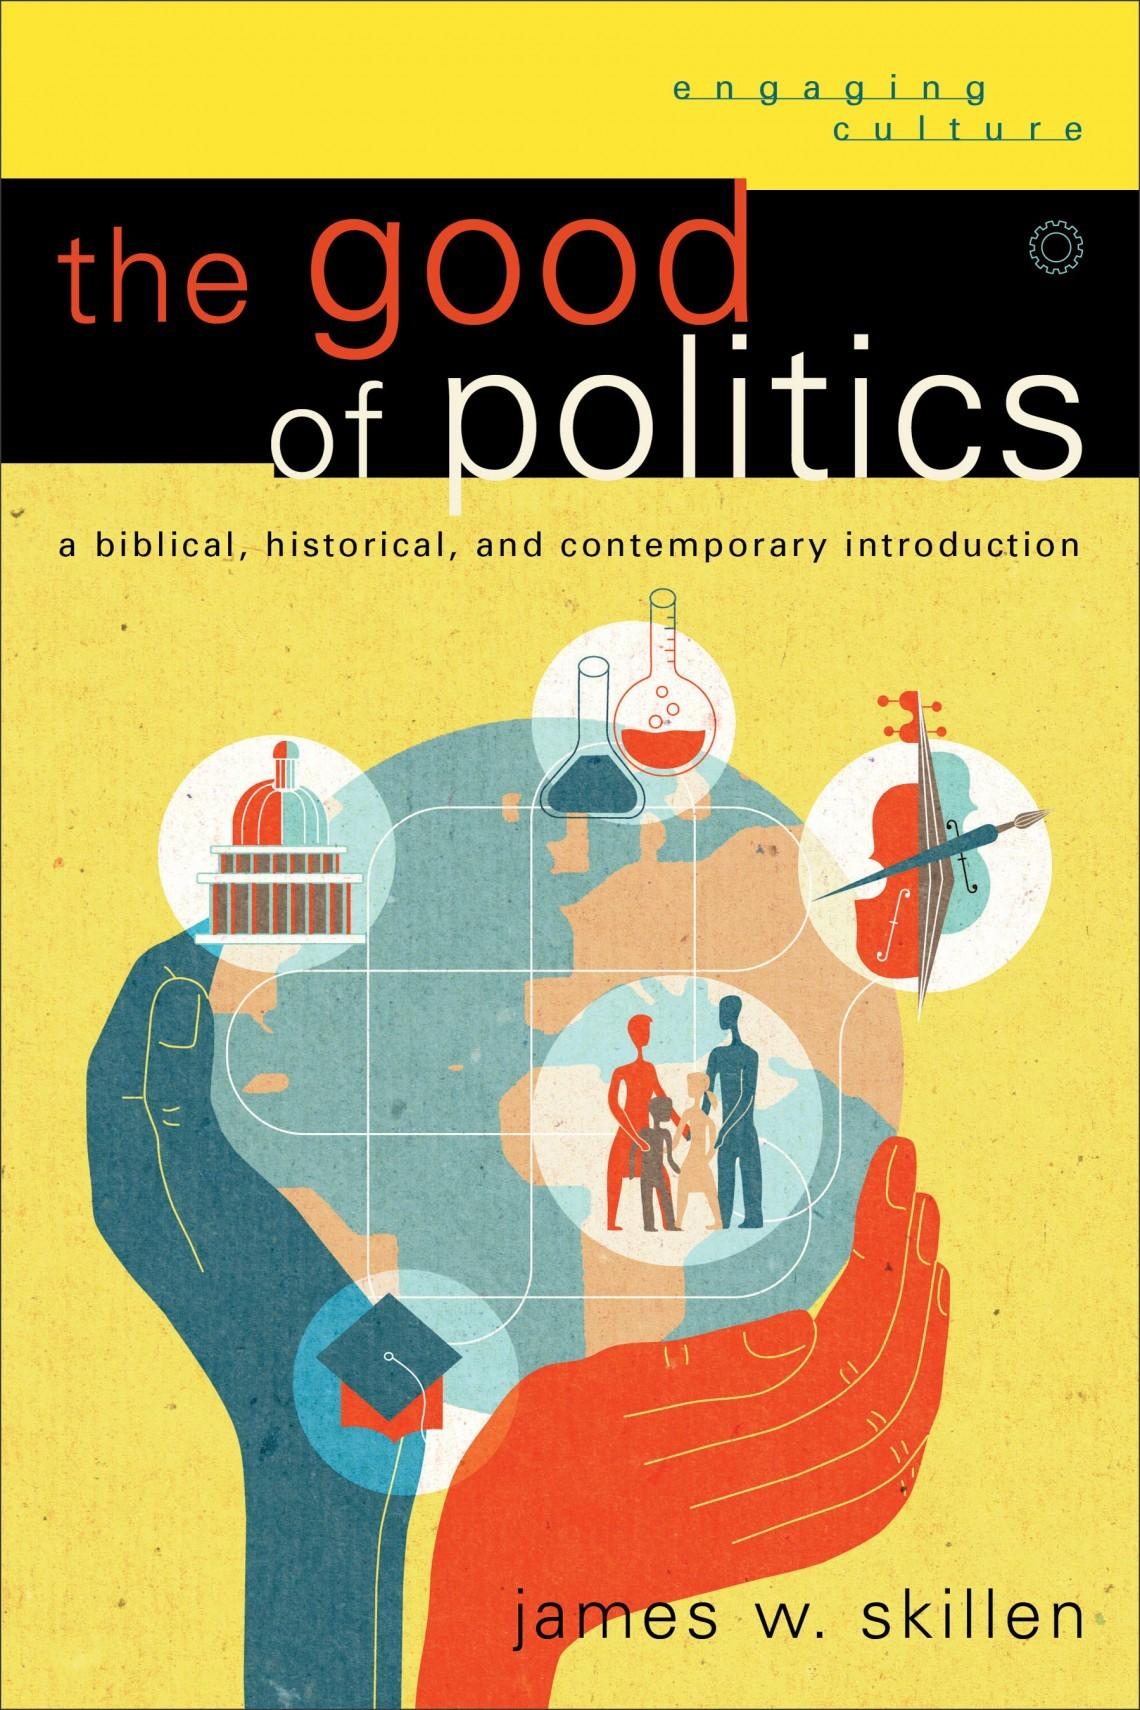 A creational basis for political life